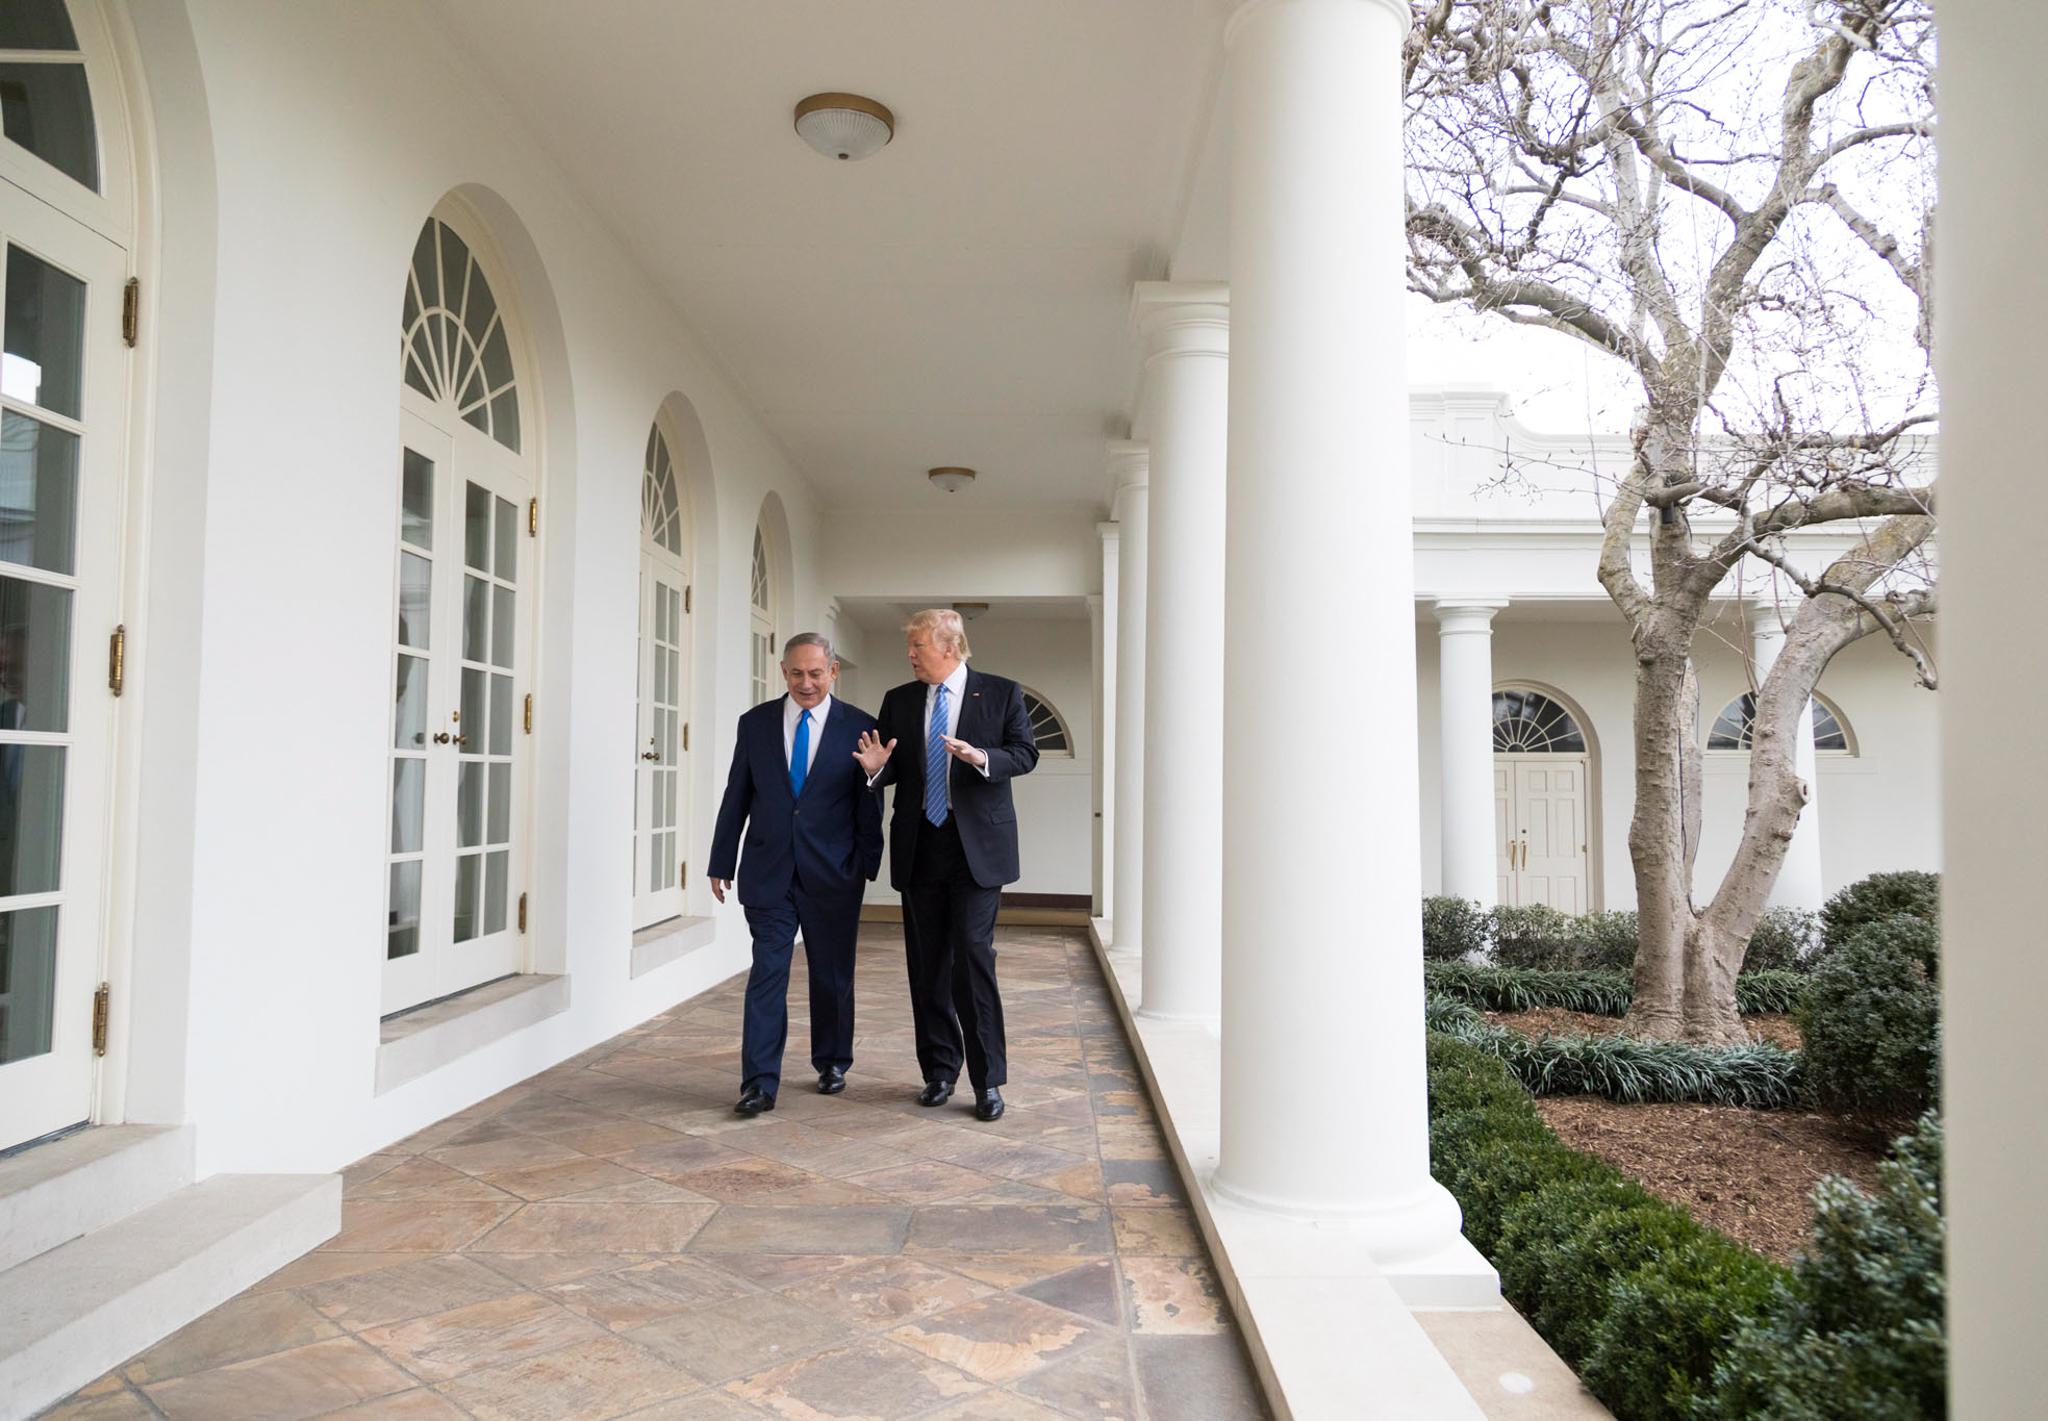 Benjamin Netanyahu and President Trump at White House (Official White House Photo/Shealah D. Craighead)